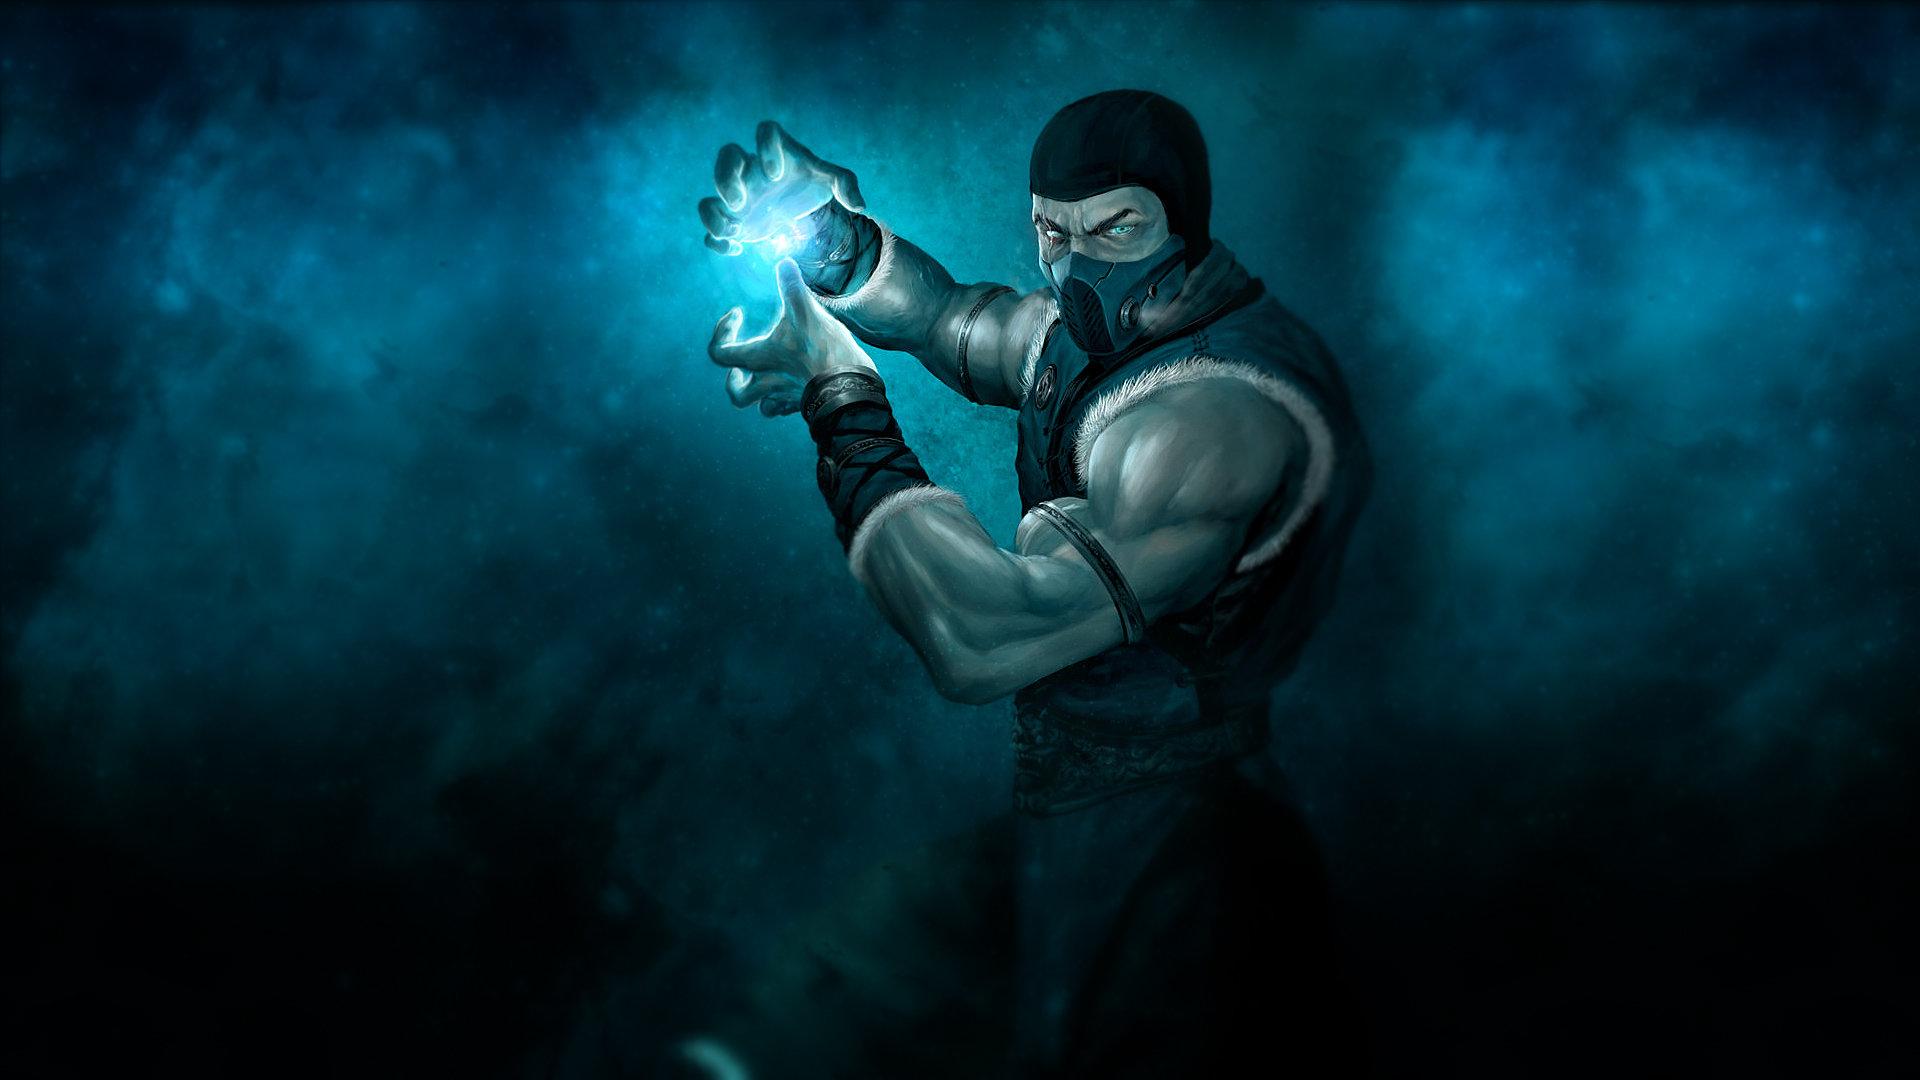 Download 1080p Sub Zero Mortal Kombat PC Wallpaper ID183221 For Free